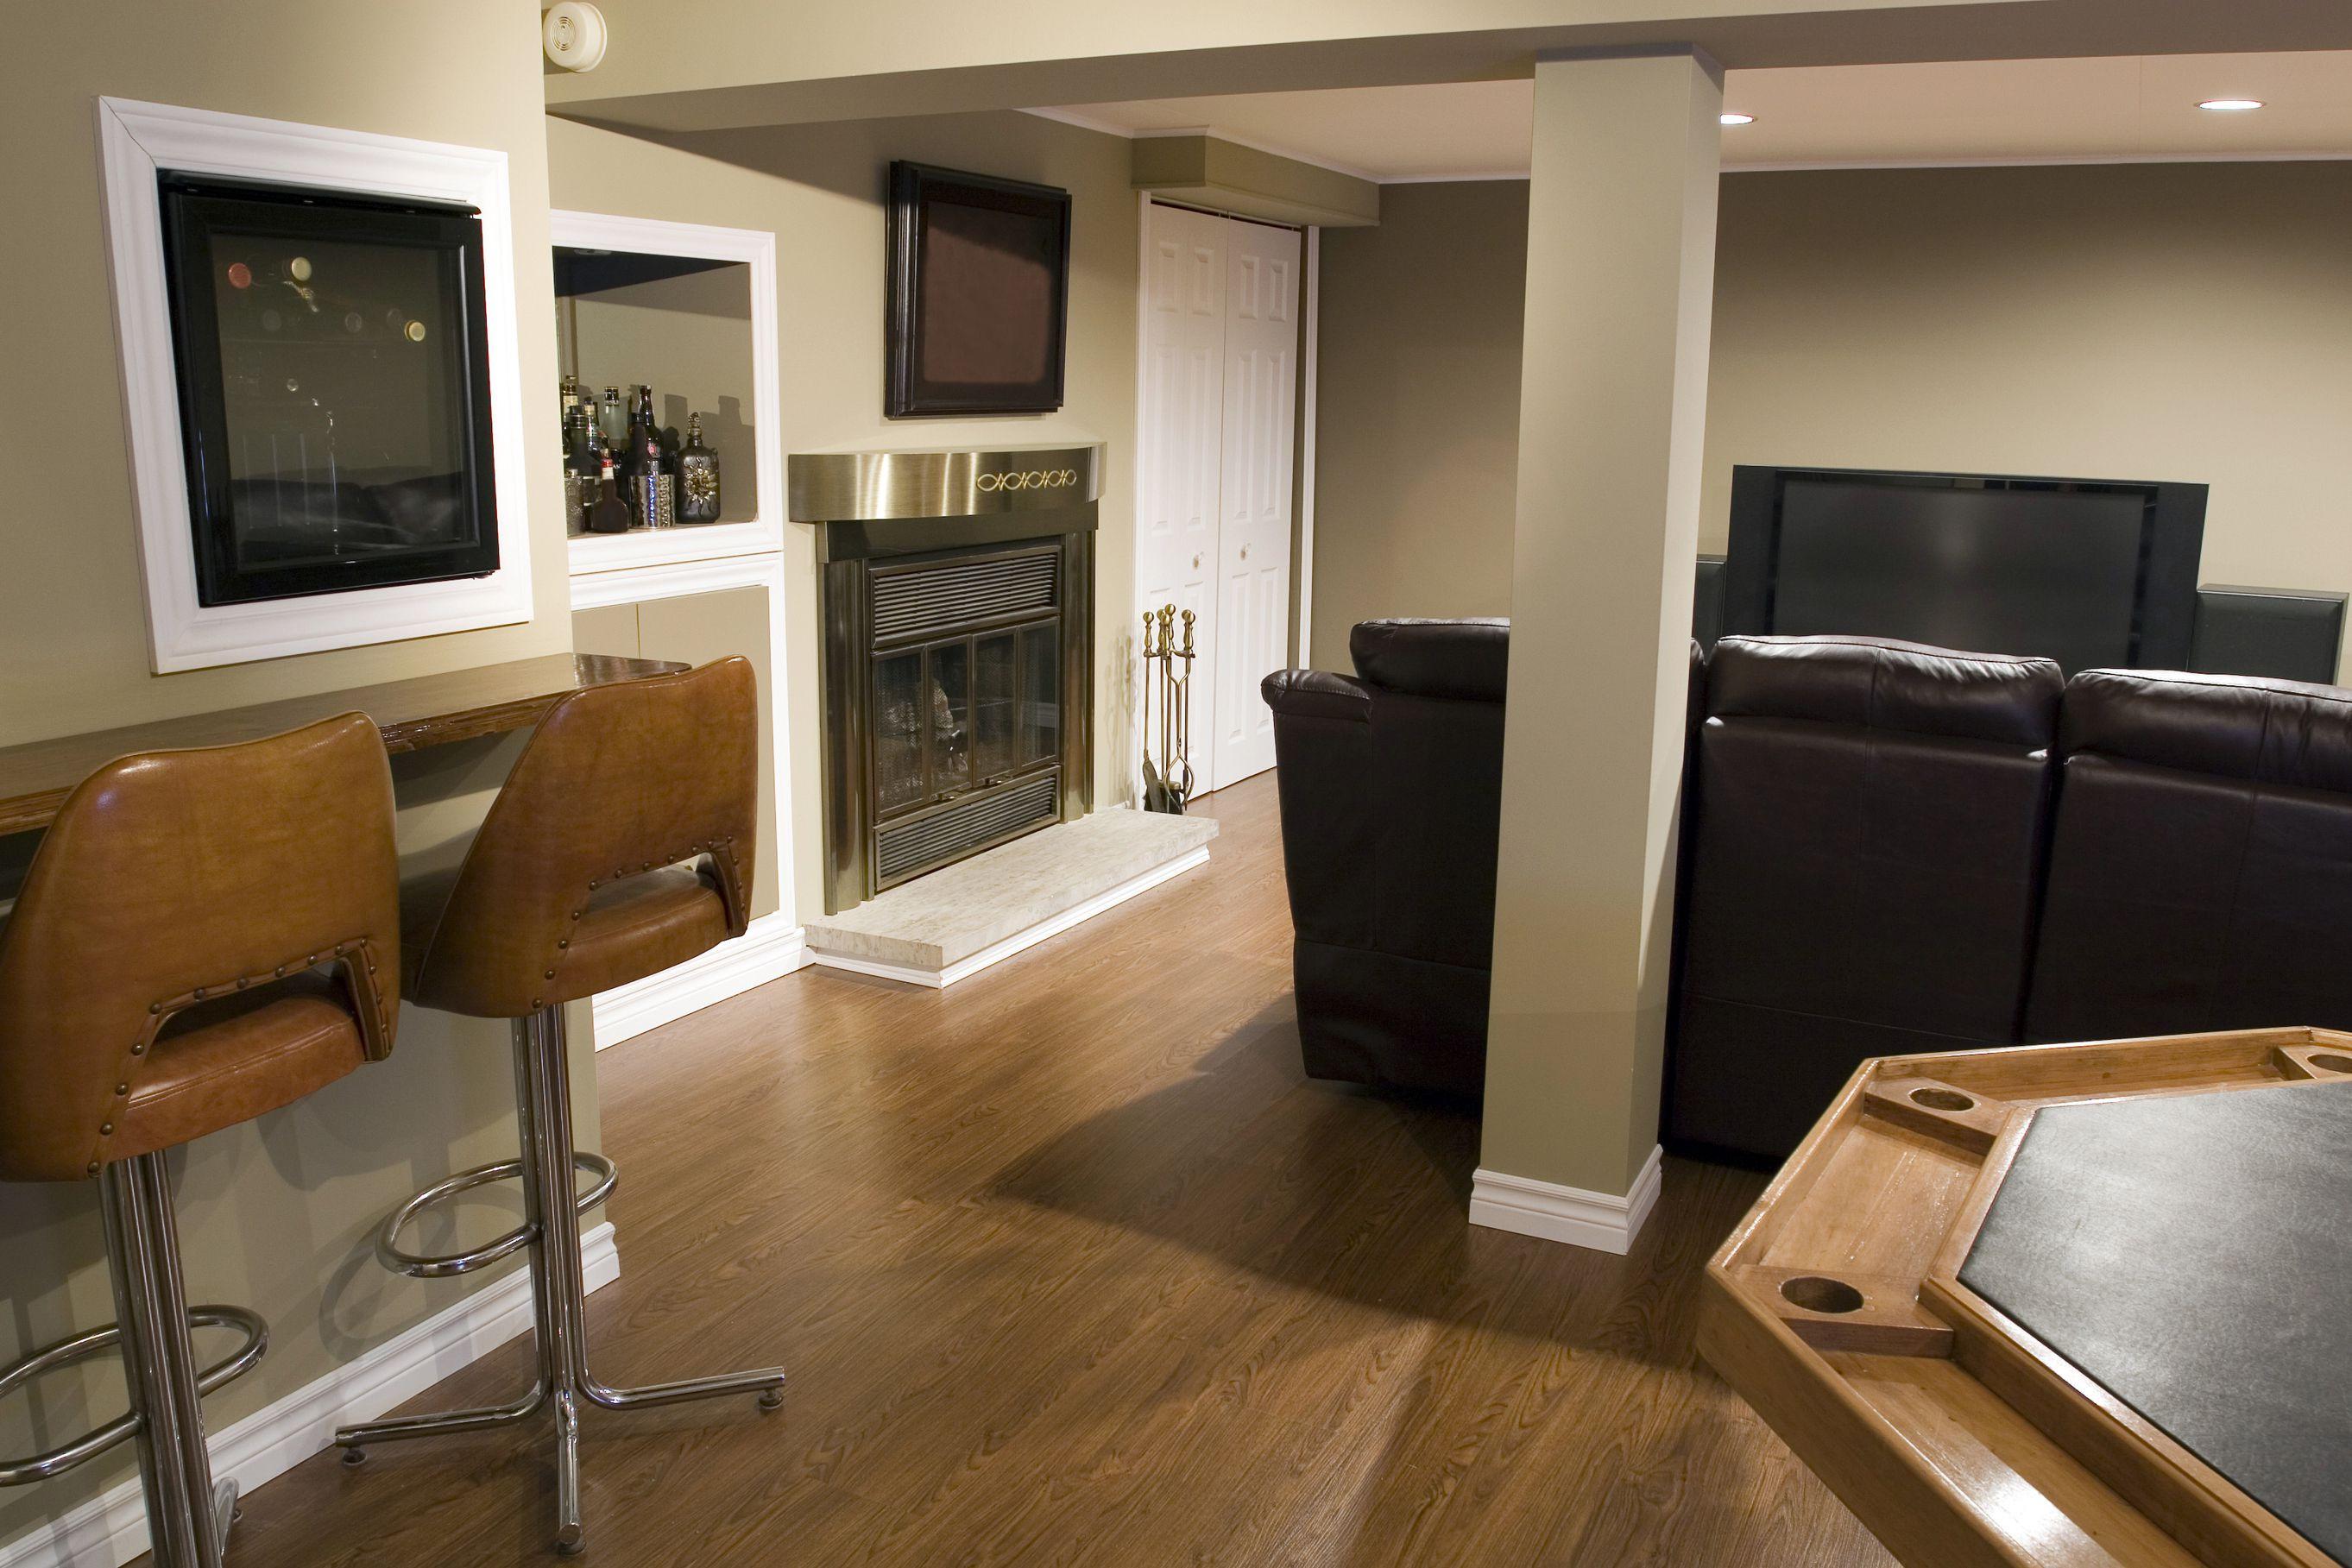 hardwood floor repair mn of best basement flooring options with basementflooring 5bb76ea04cedfd00261522e8